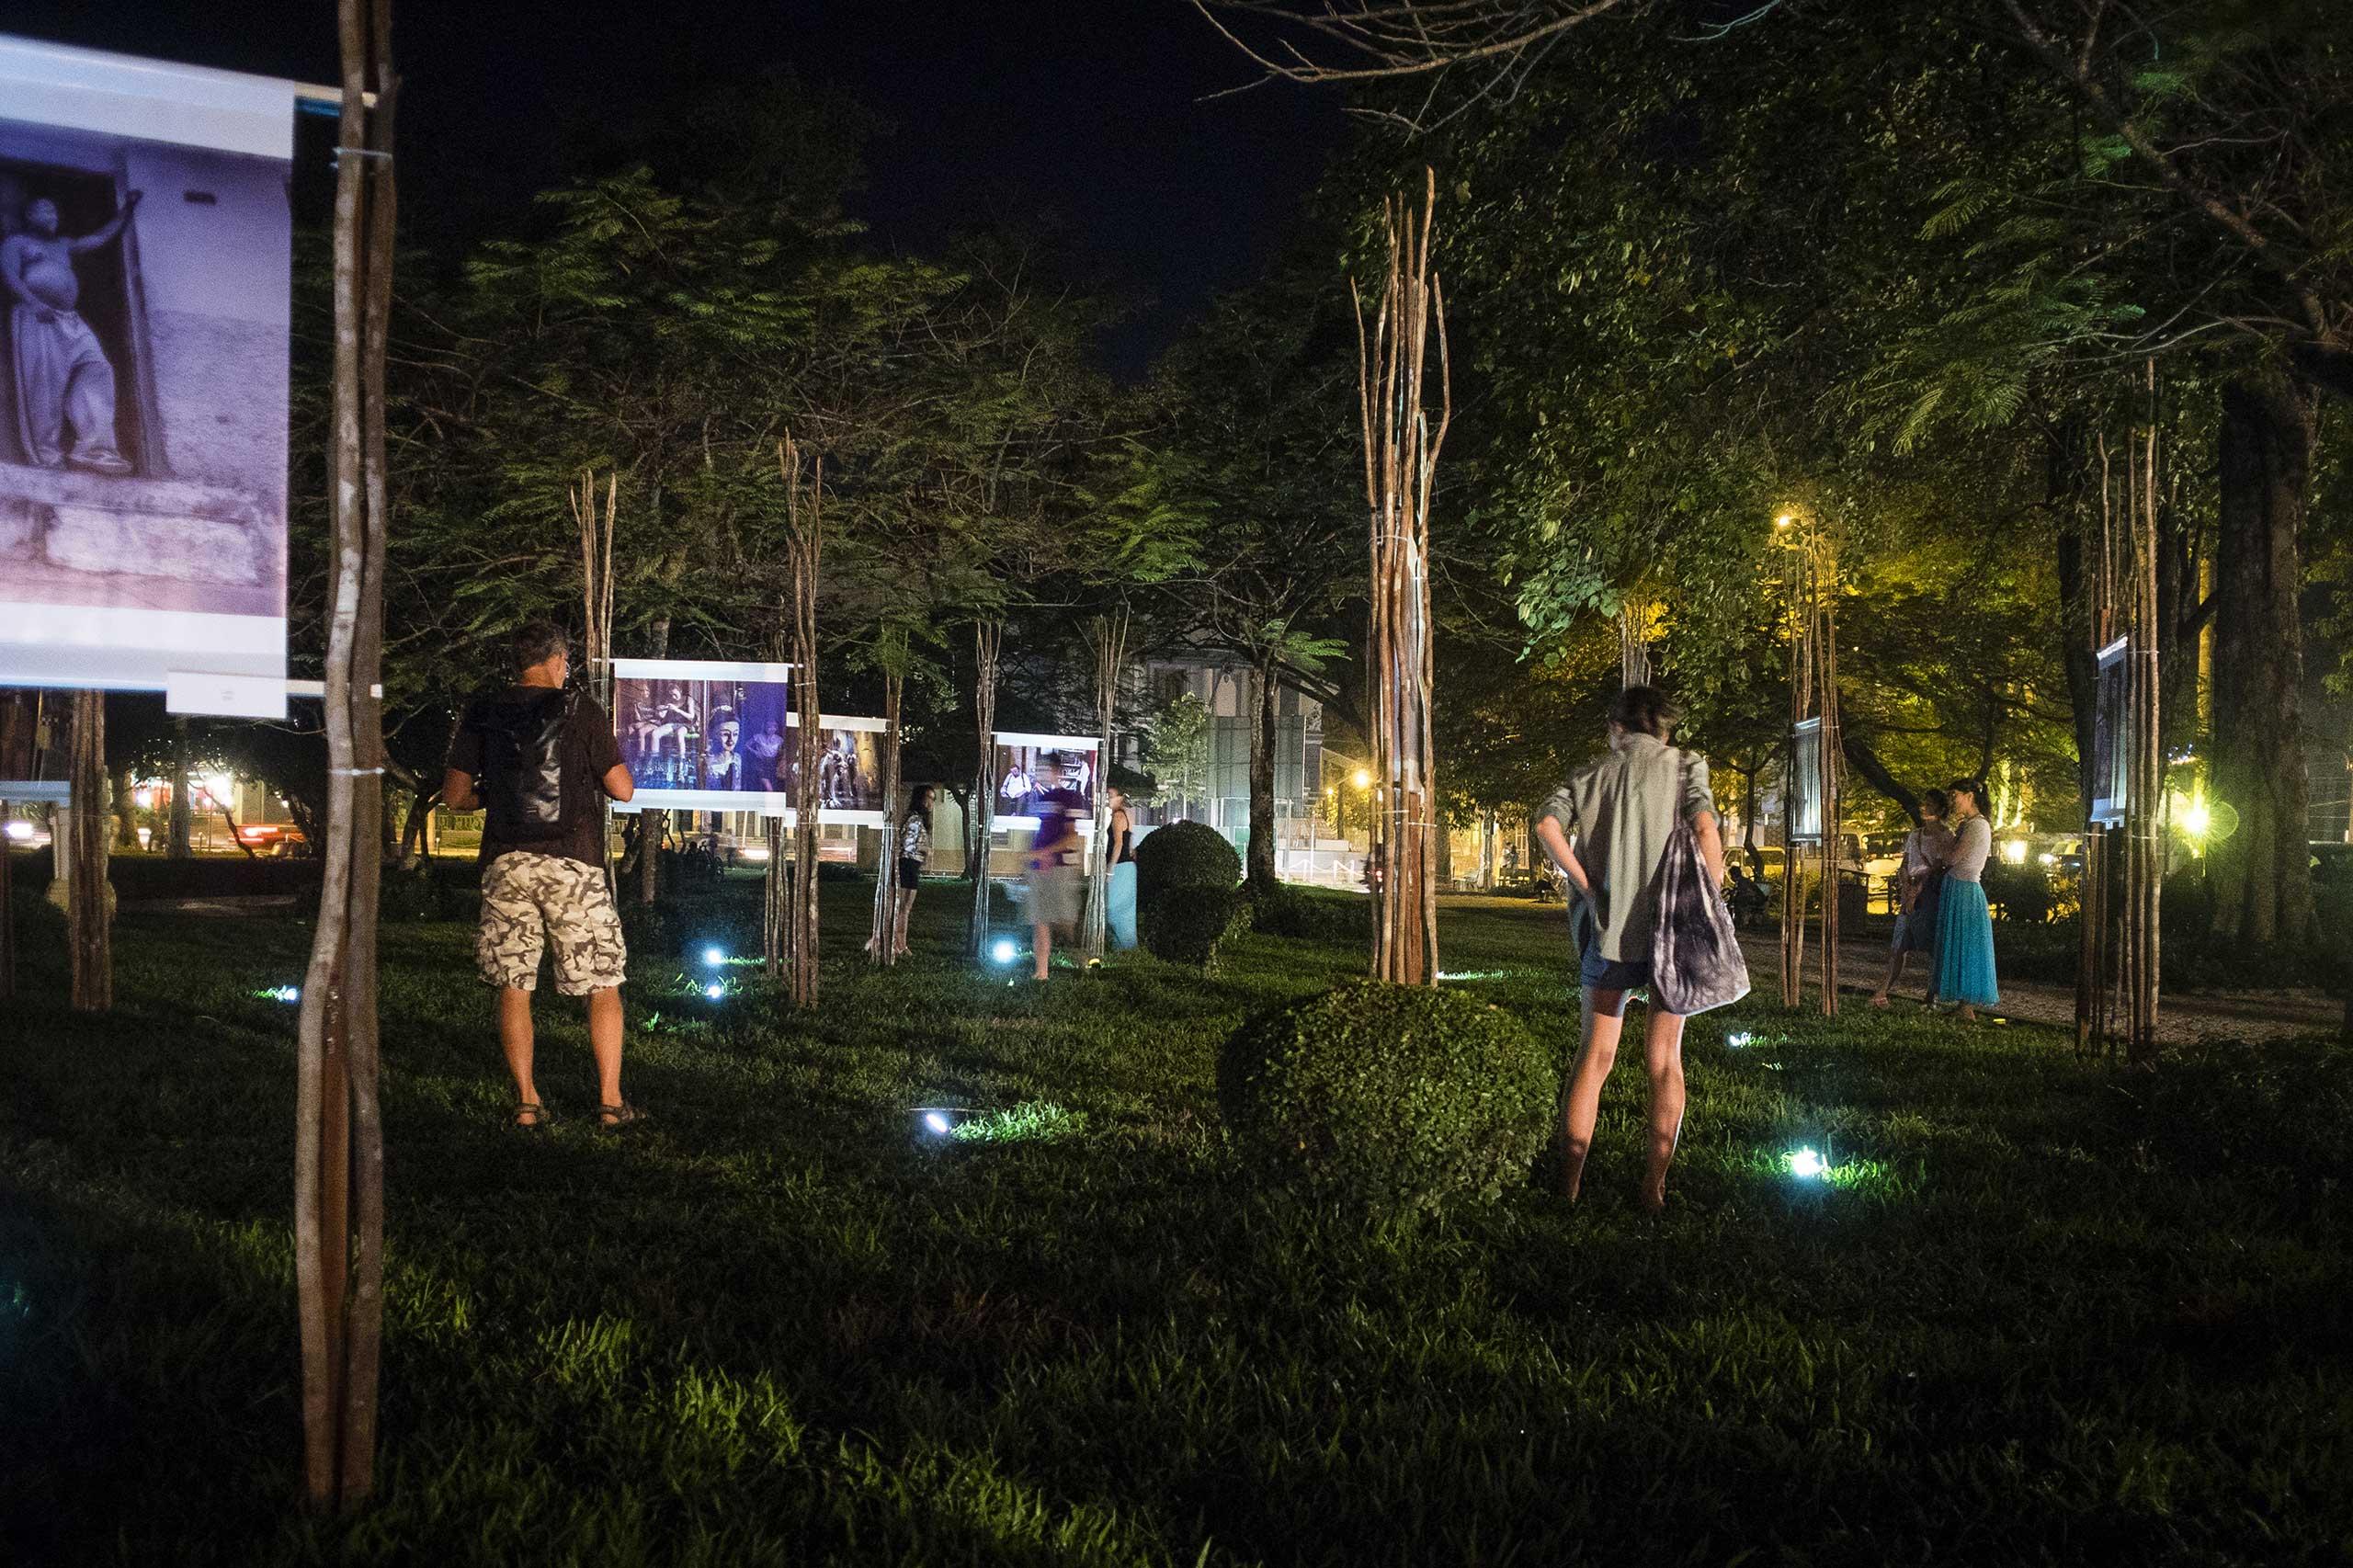 Visitors view the Gabi Ben-Avraham exhibition at Angkor Photo Festival in Dec. 2015.